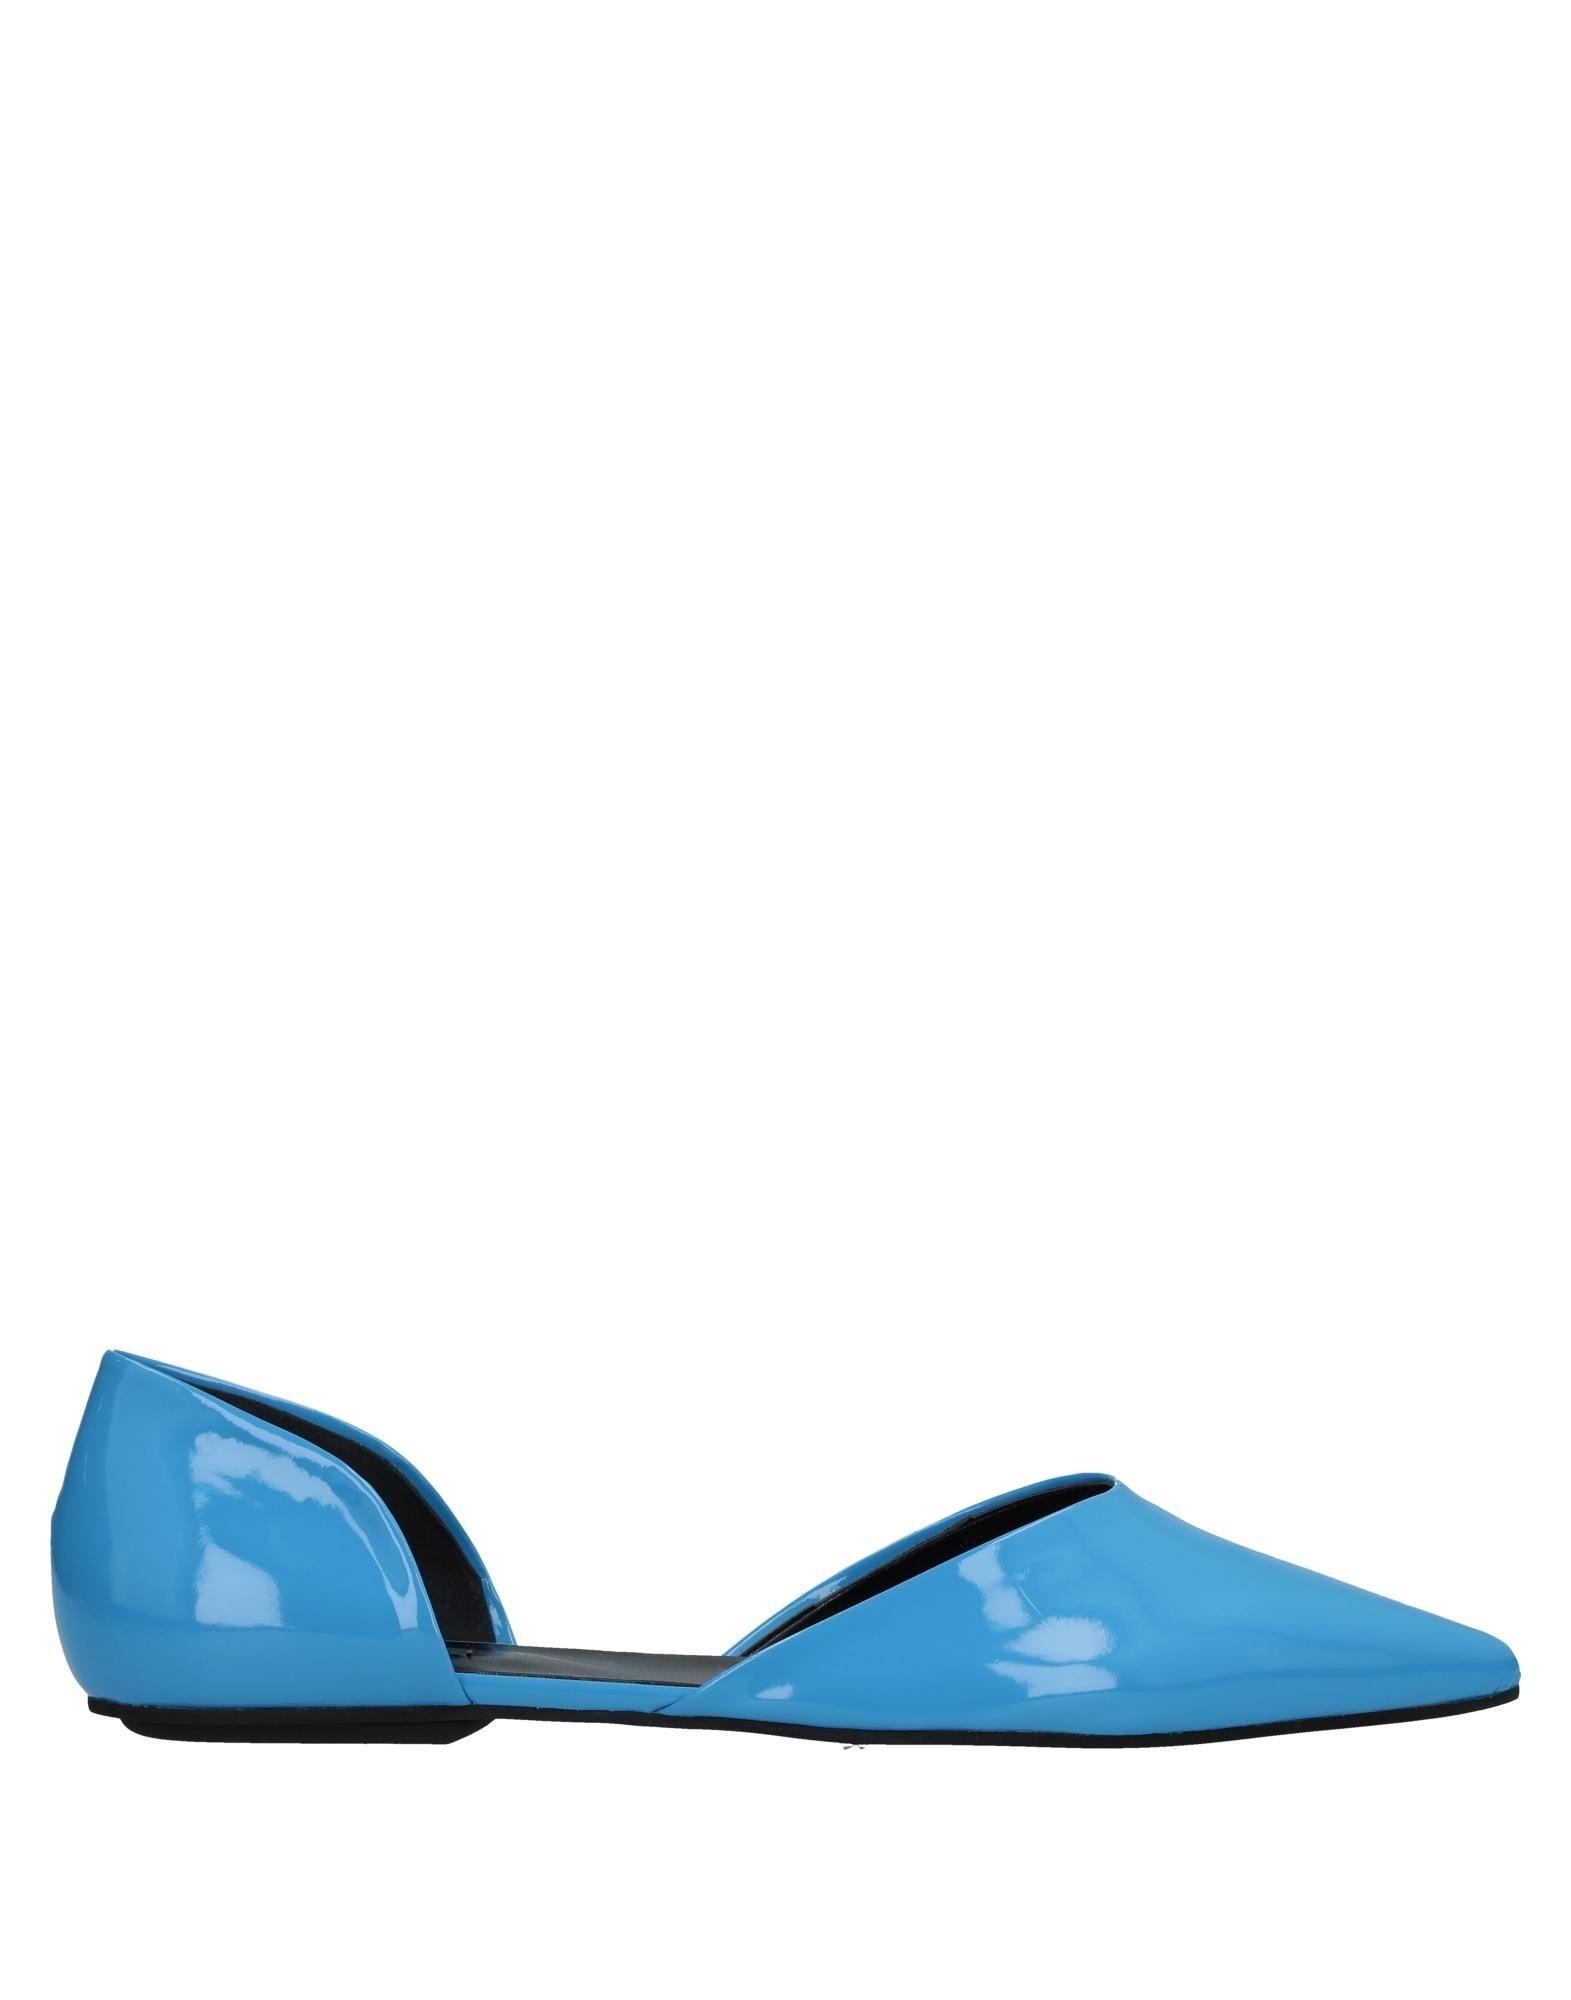 Ballerine - Blue Les Copains Donna - Ballerine 11536016KE b4a2c8